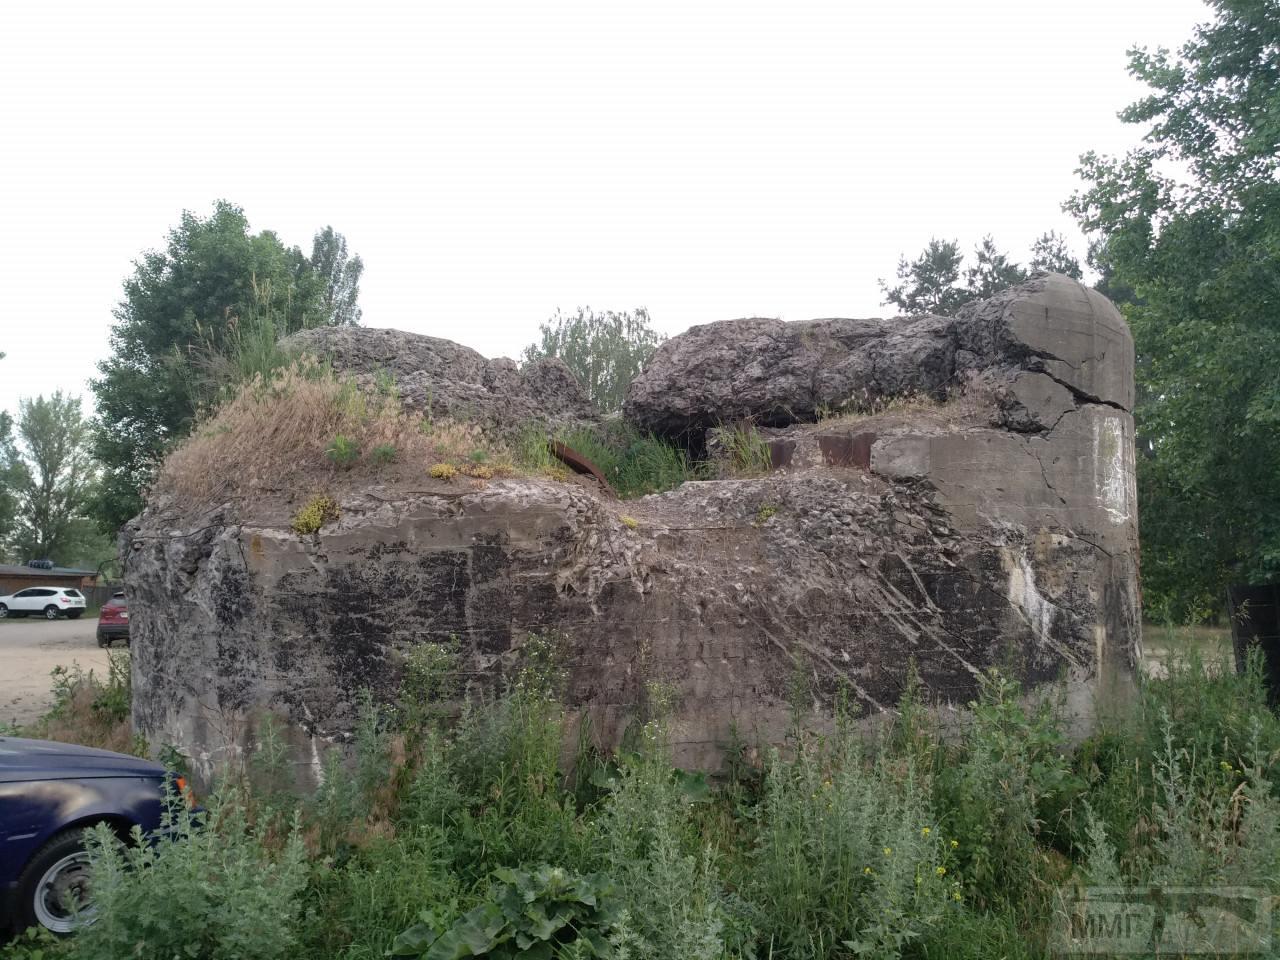 106818 - Копарські дні і будні.